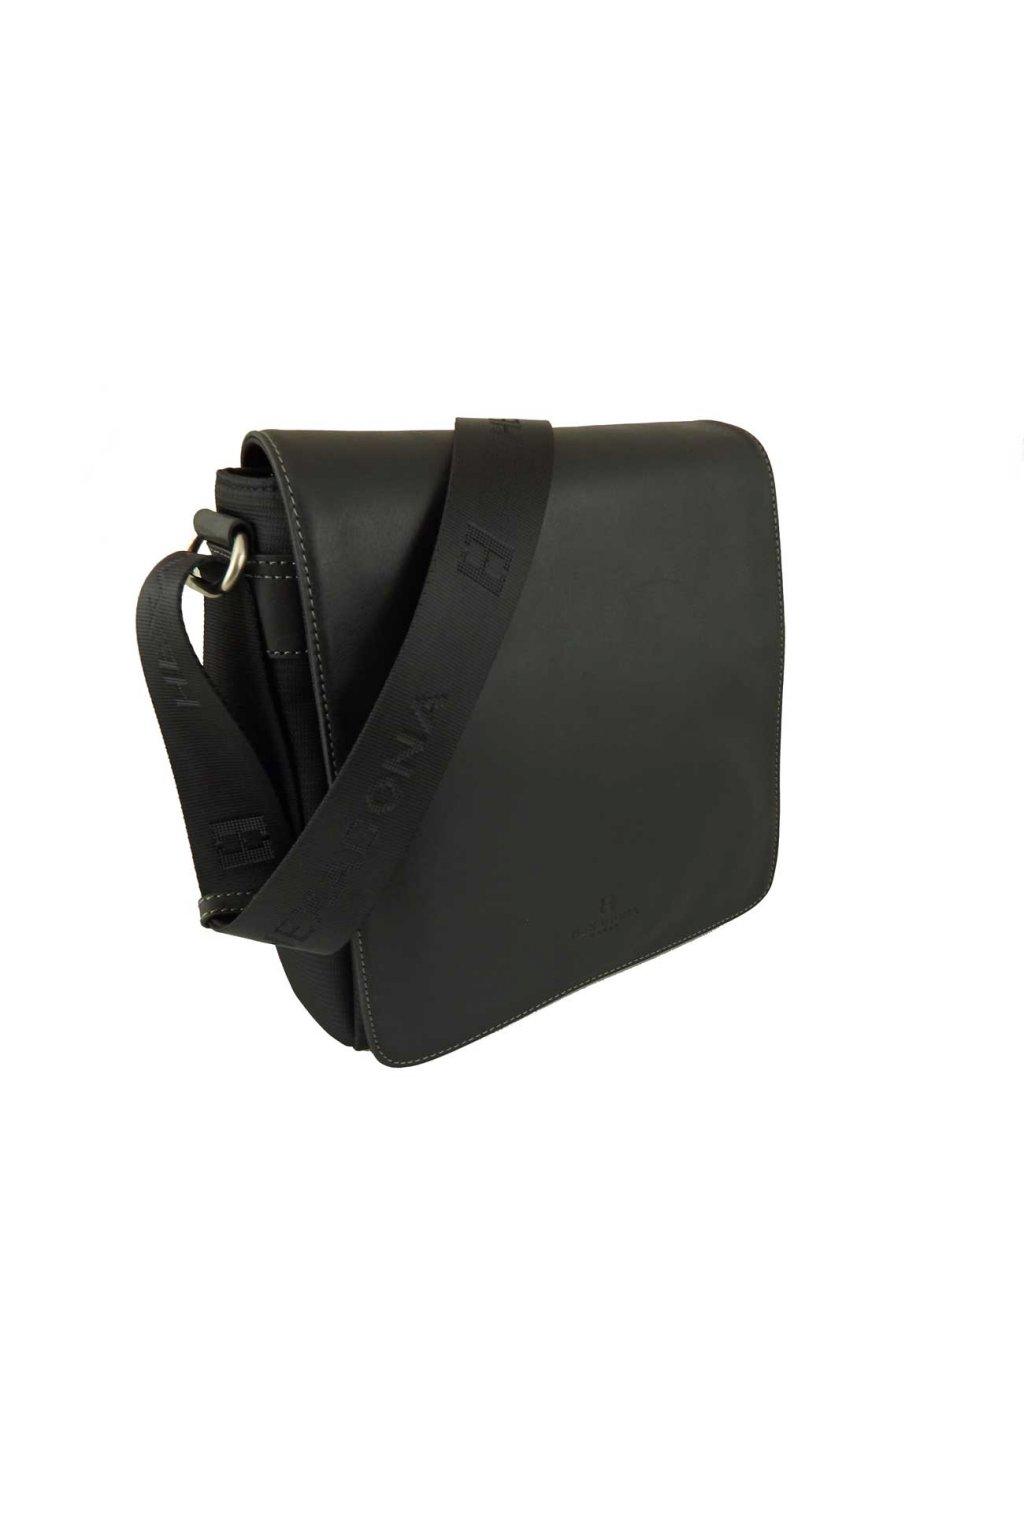 panska kozena taska pres rameno cerna PTK03 299156 2